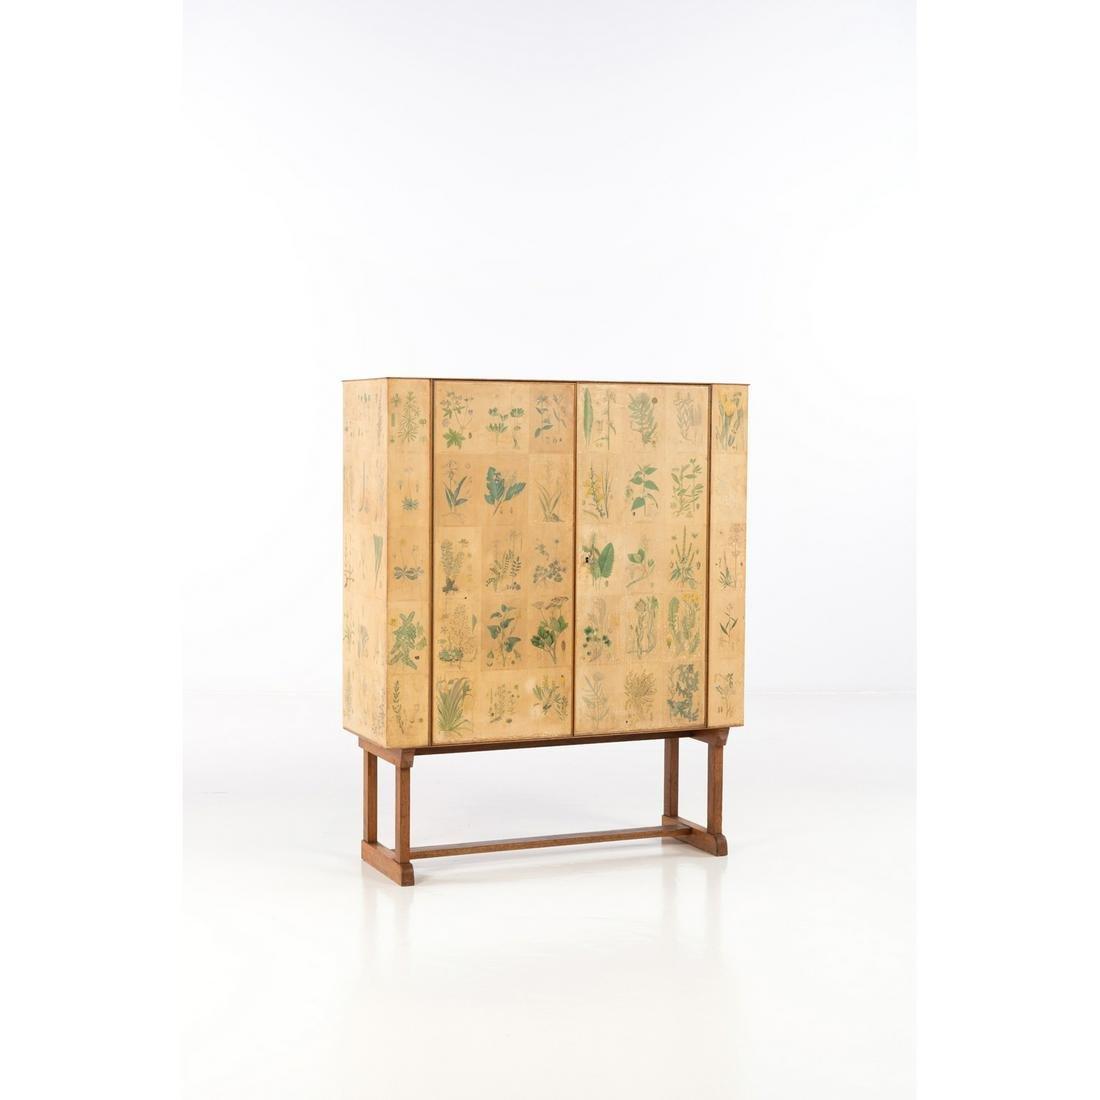 Josef Frank (1885-1967) Flora Cabinet Mahogany, birch